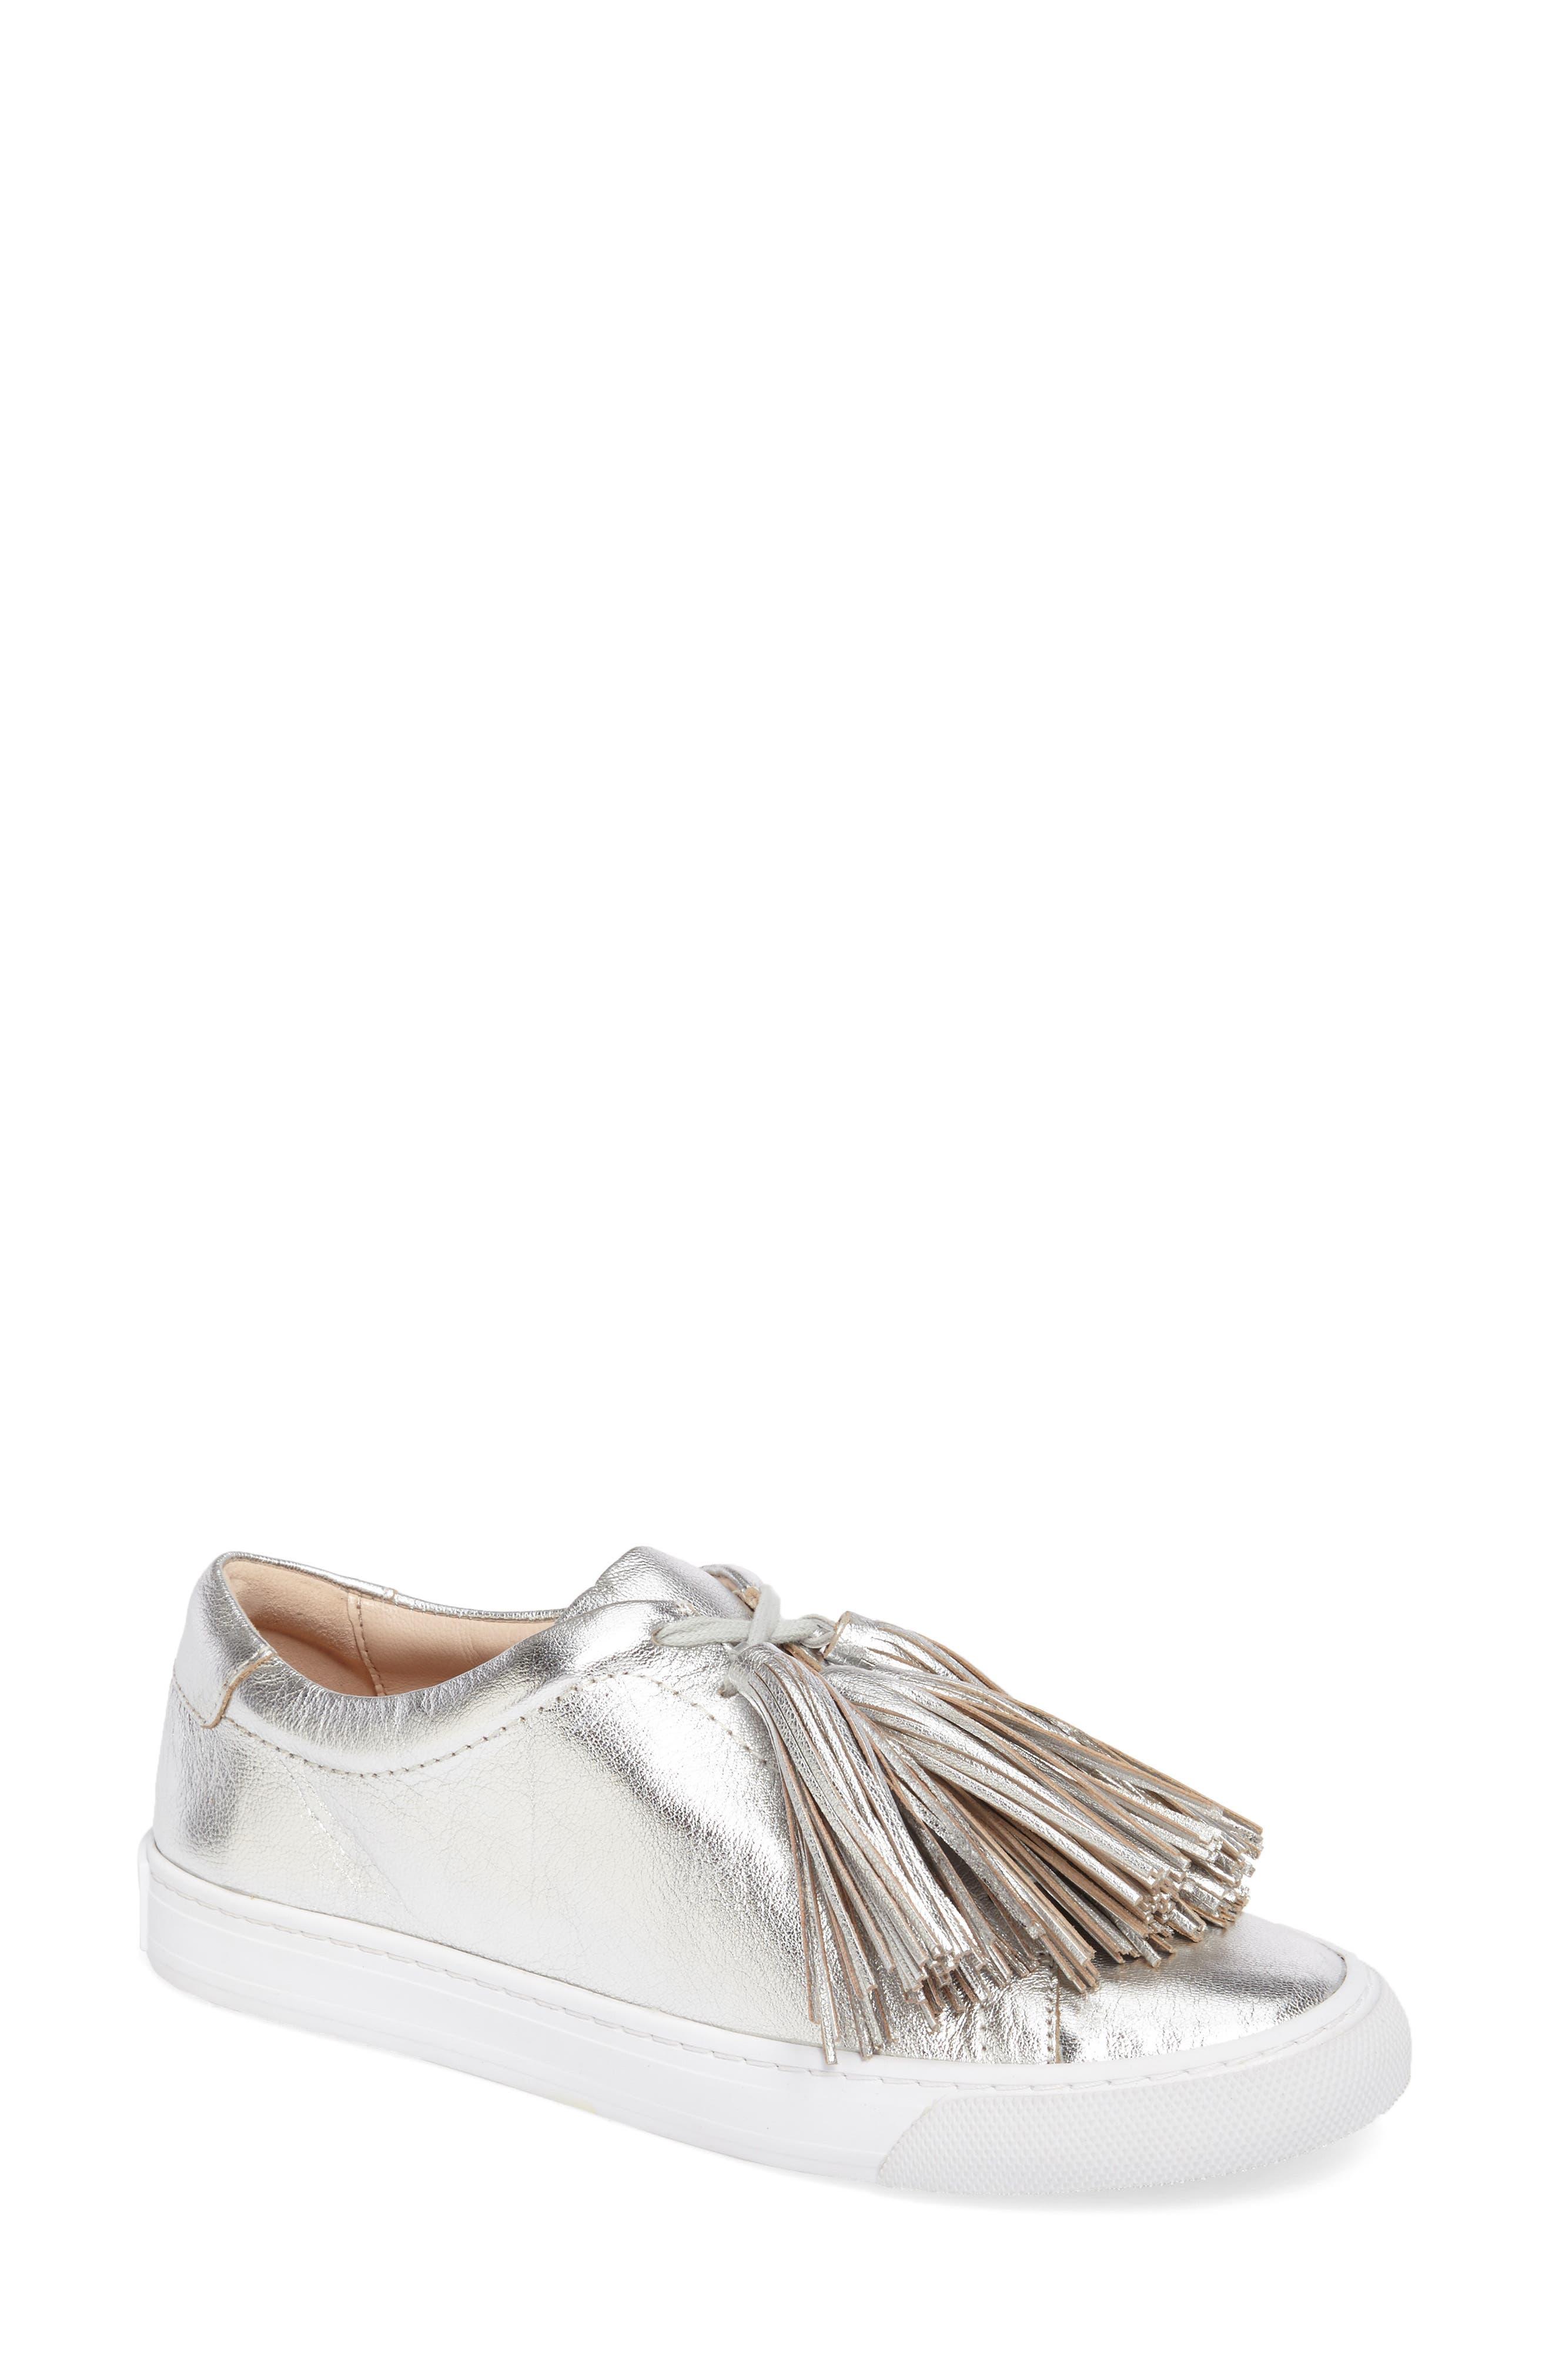 Alternate Image 1 Selected - Loeffler Randall Logan Sneaker (Women)